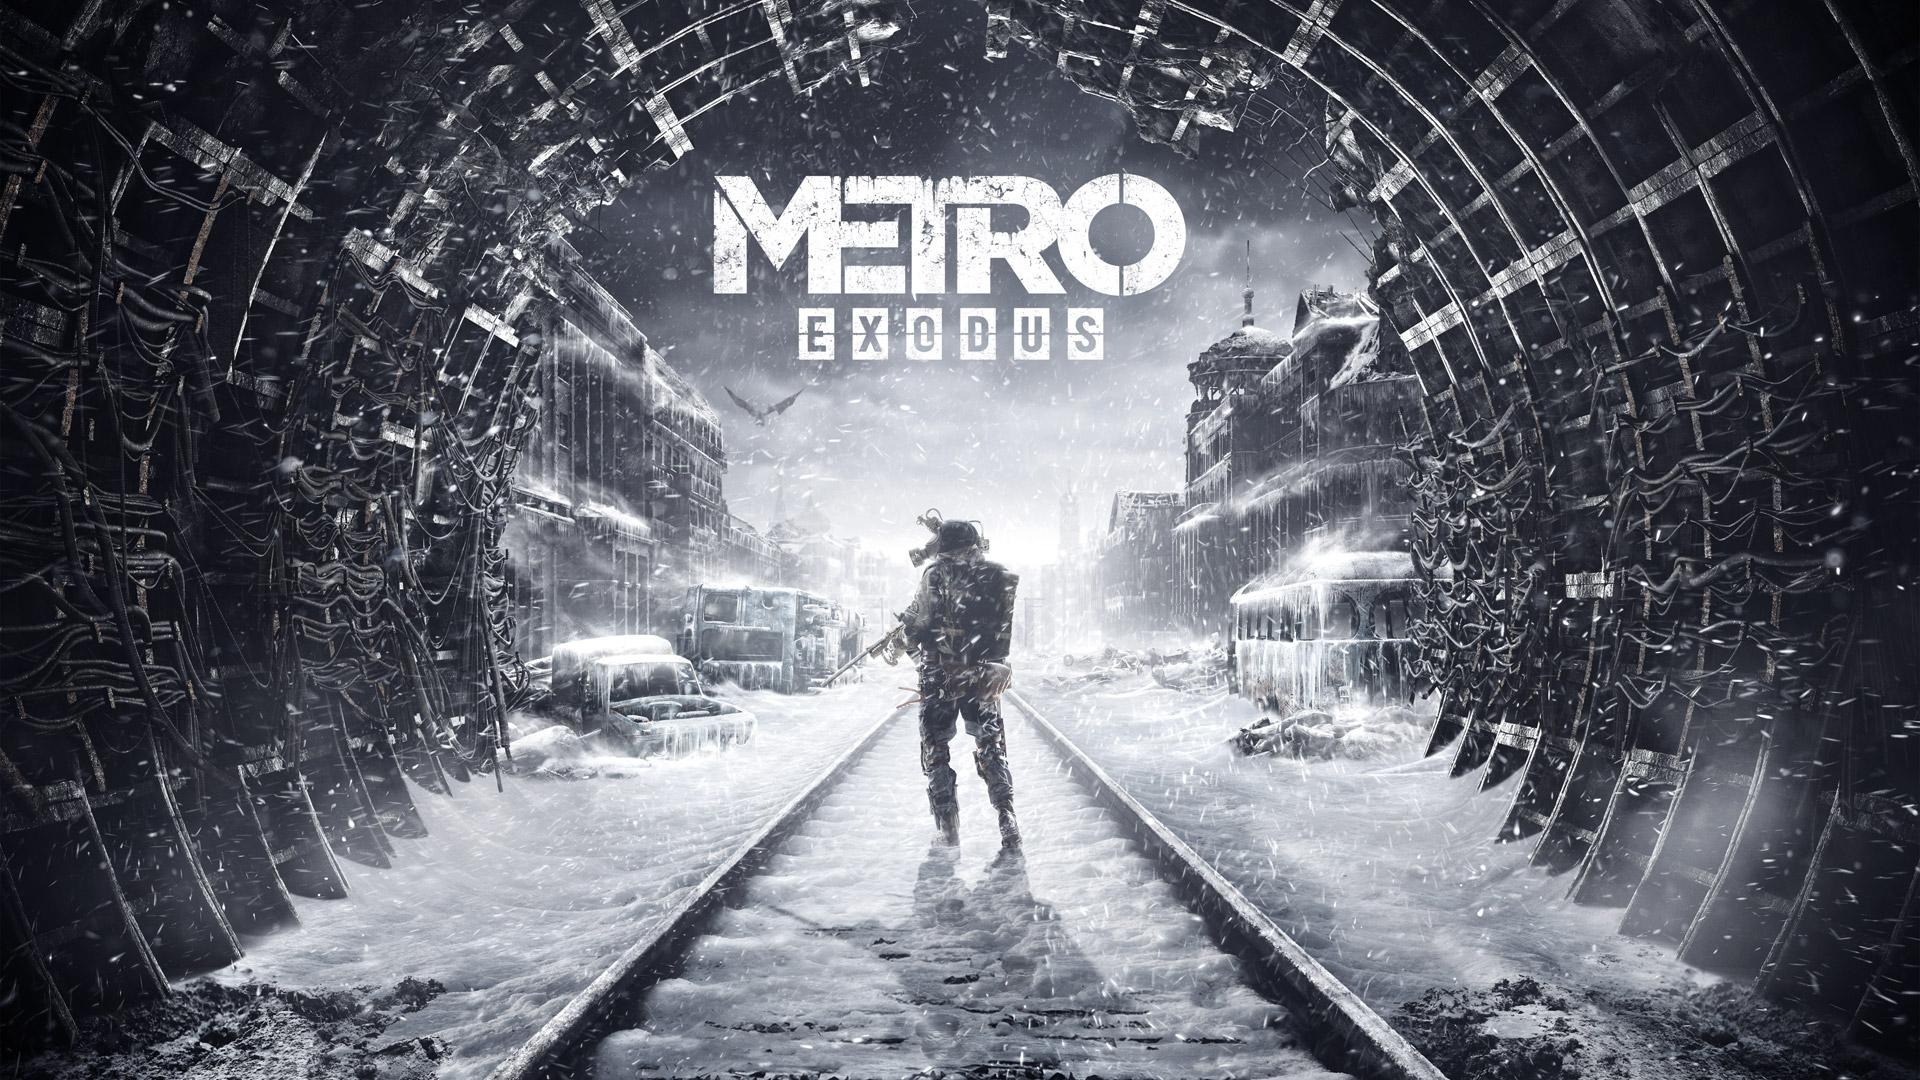 metro exodus la date de sortie du jeu est d cal e metatrone. Black Bedroom Furniture Sets. Home Design Ideas